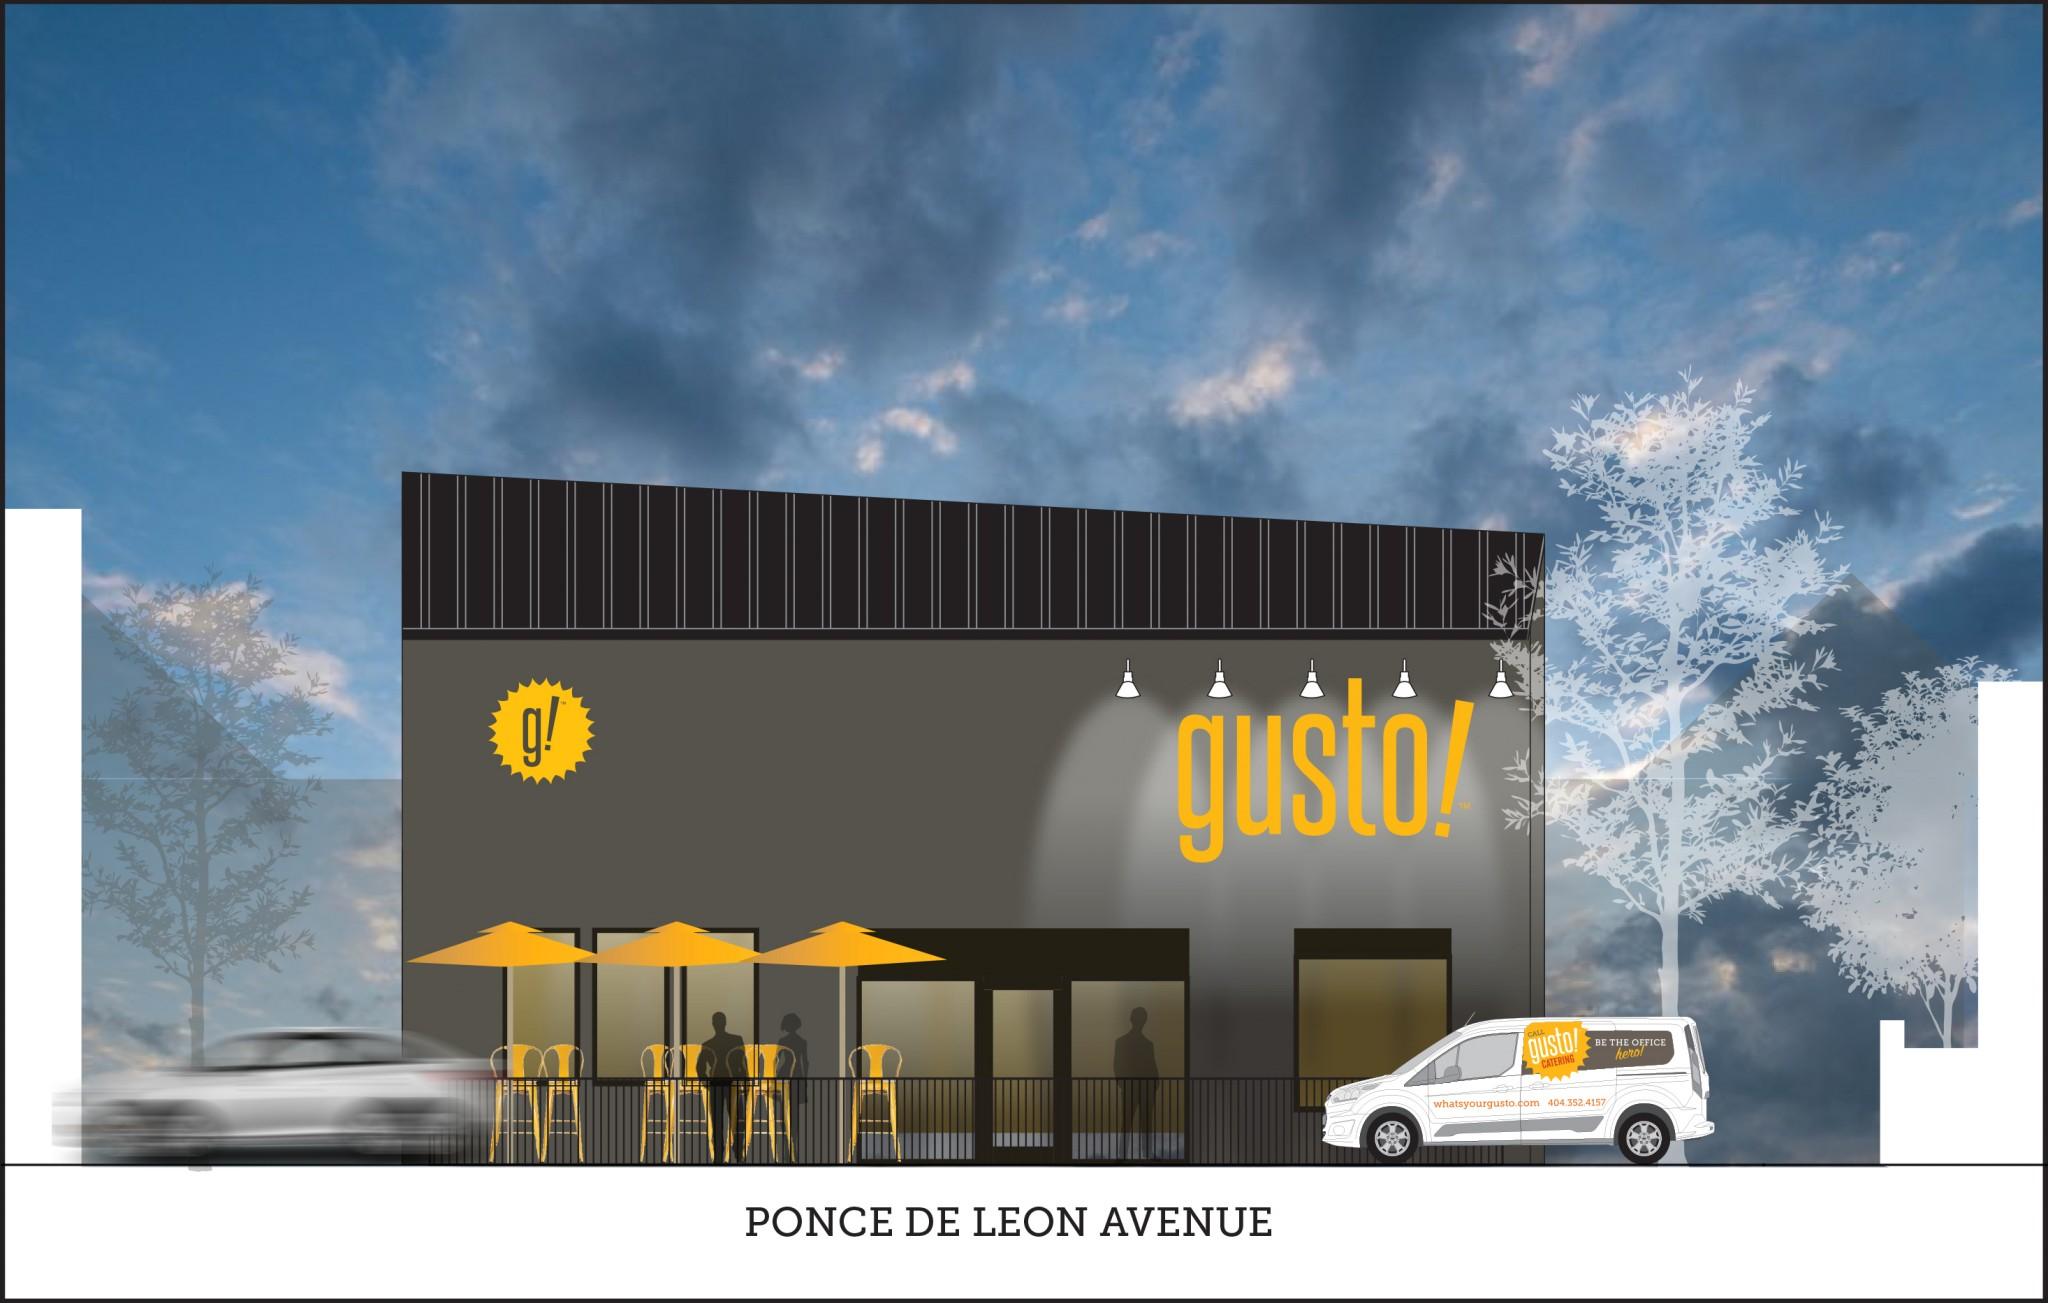 gusto!_782 Ponce de Leon Avenue rendering by Lindsay Denman